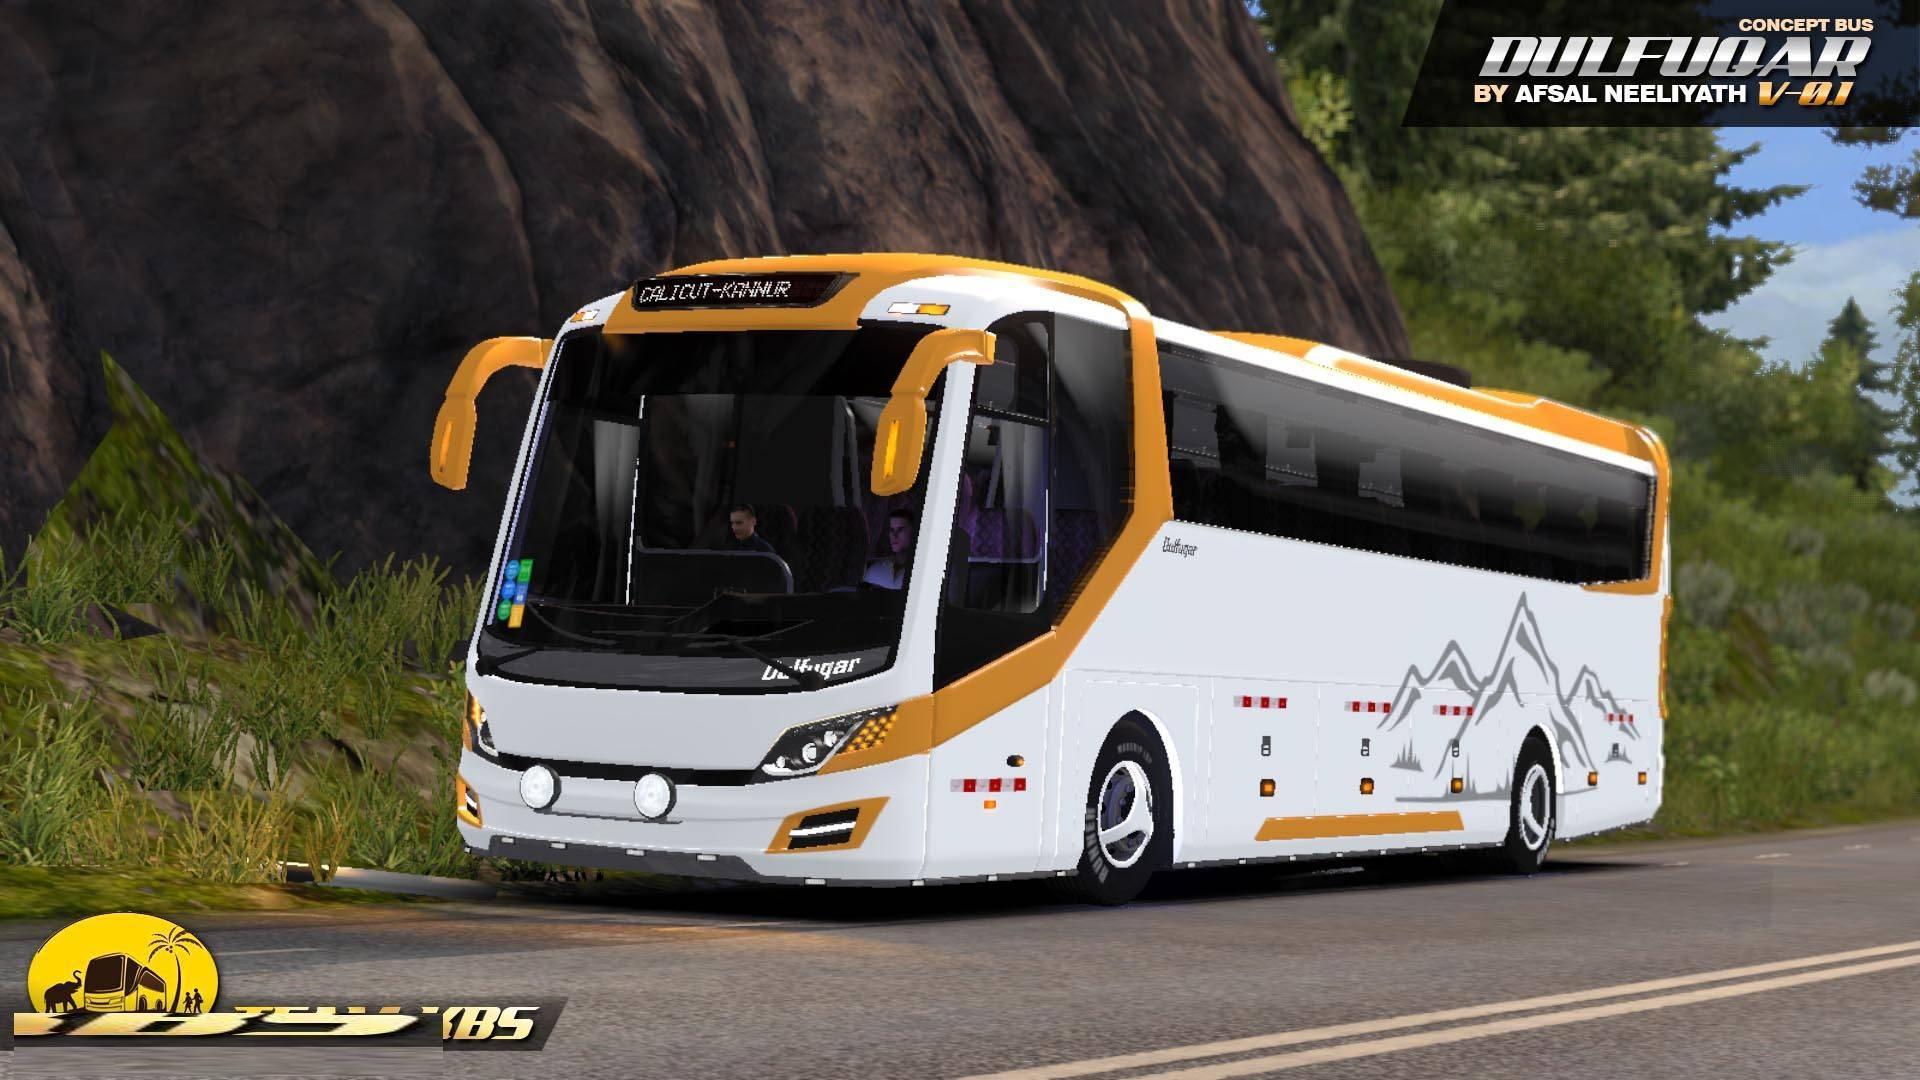 ETS2 - Dulfuqar Concept Bus V1.0 (1.36.x)